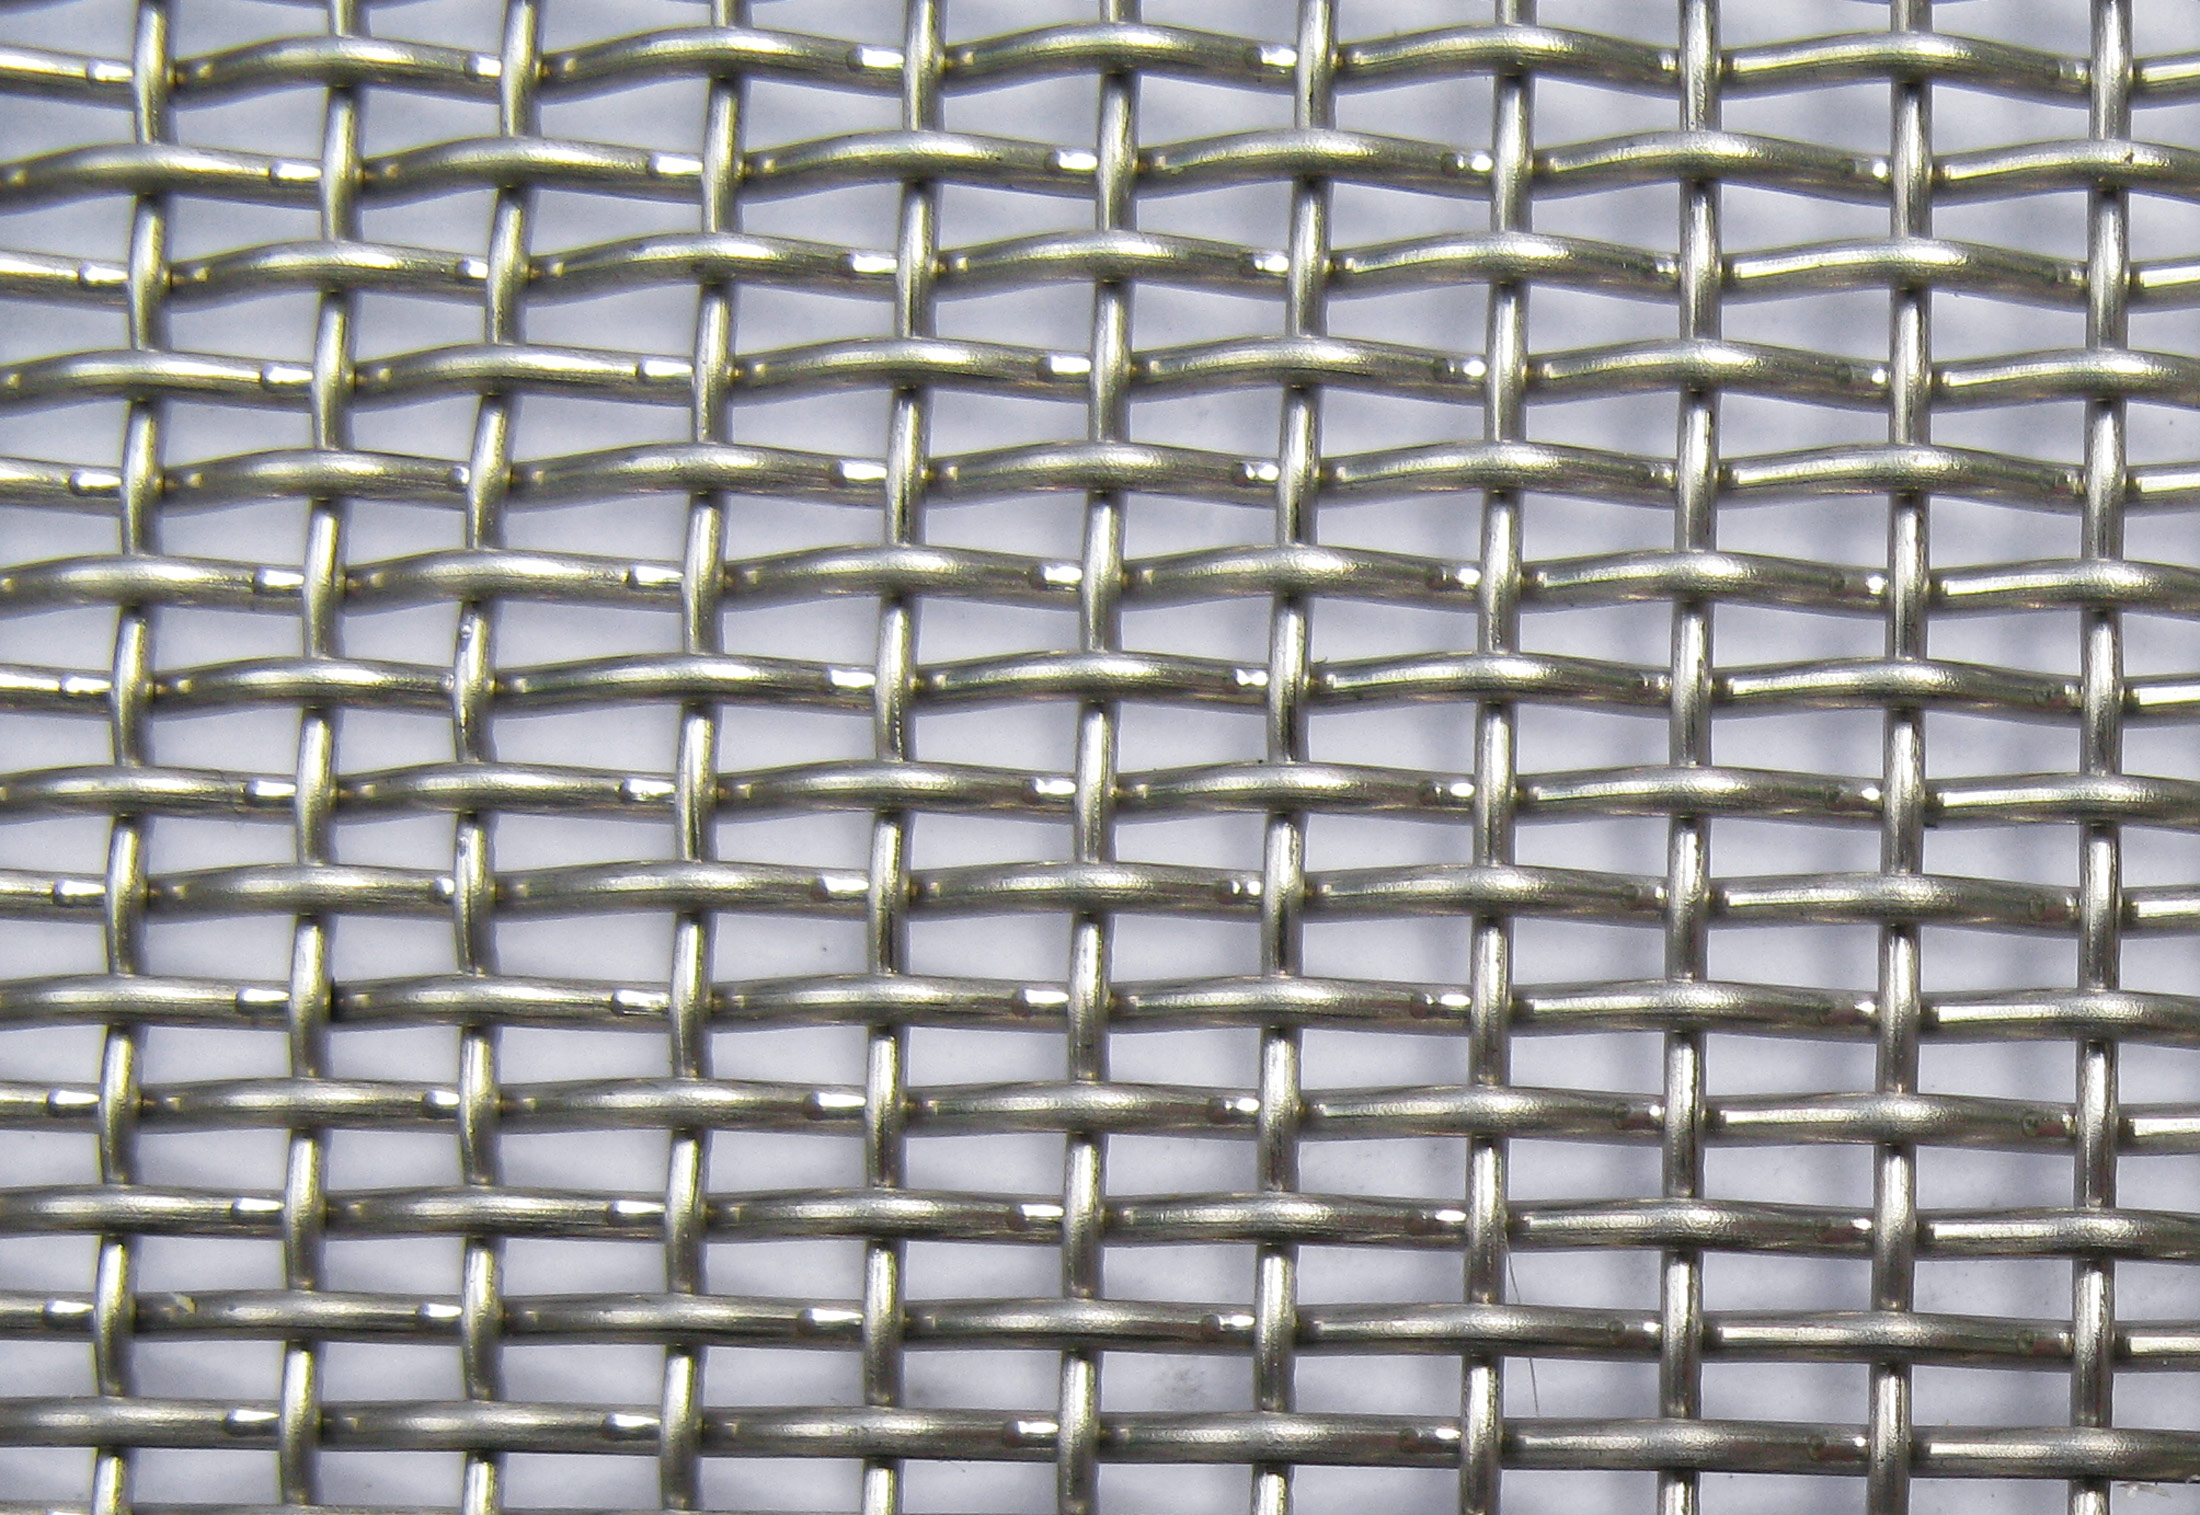 Stainless Steel Wire Mesh By Weisse Amp Eschrich Stylepark